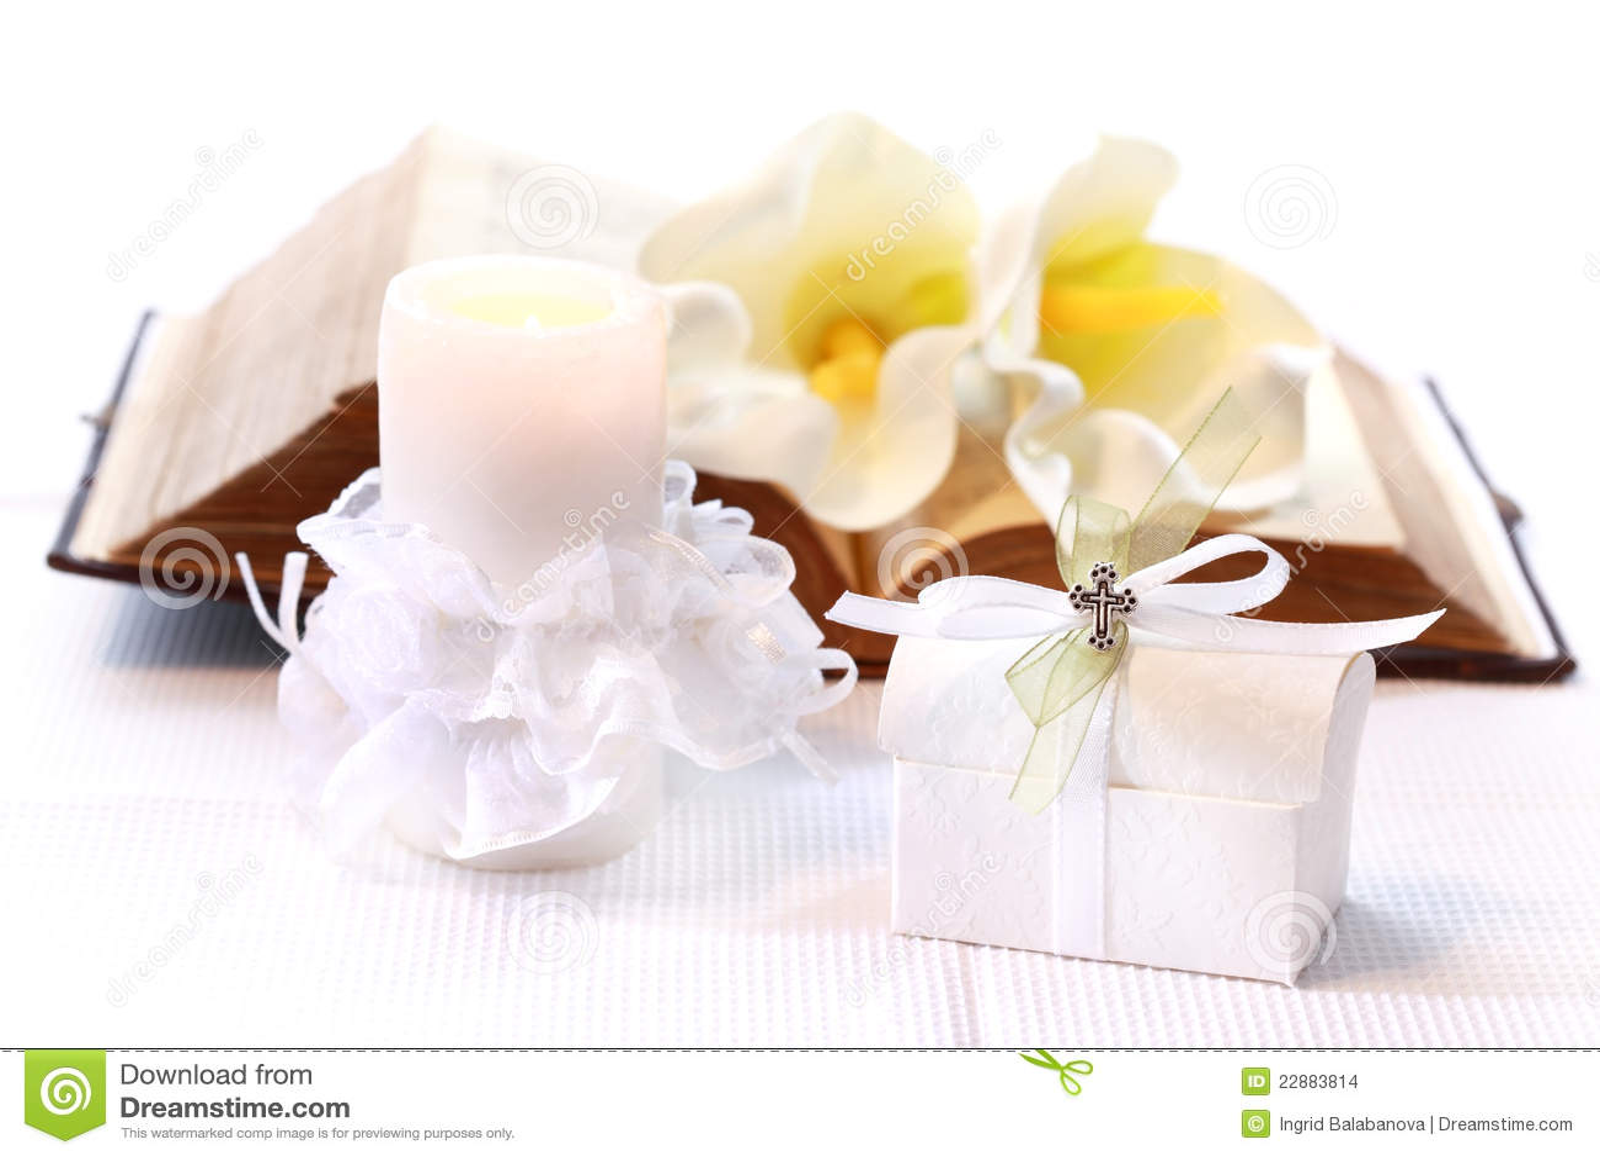 erste heilige kommunion stockbilder bild 22883814. Black Bedroom Furniture Sets. Home Design Ideas